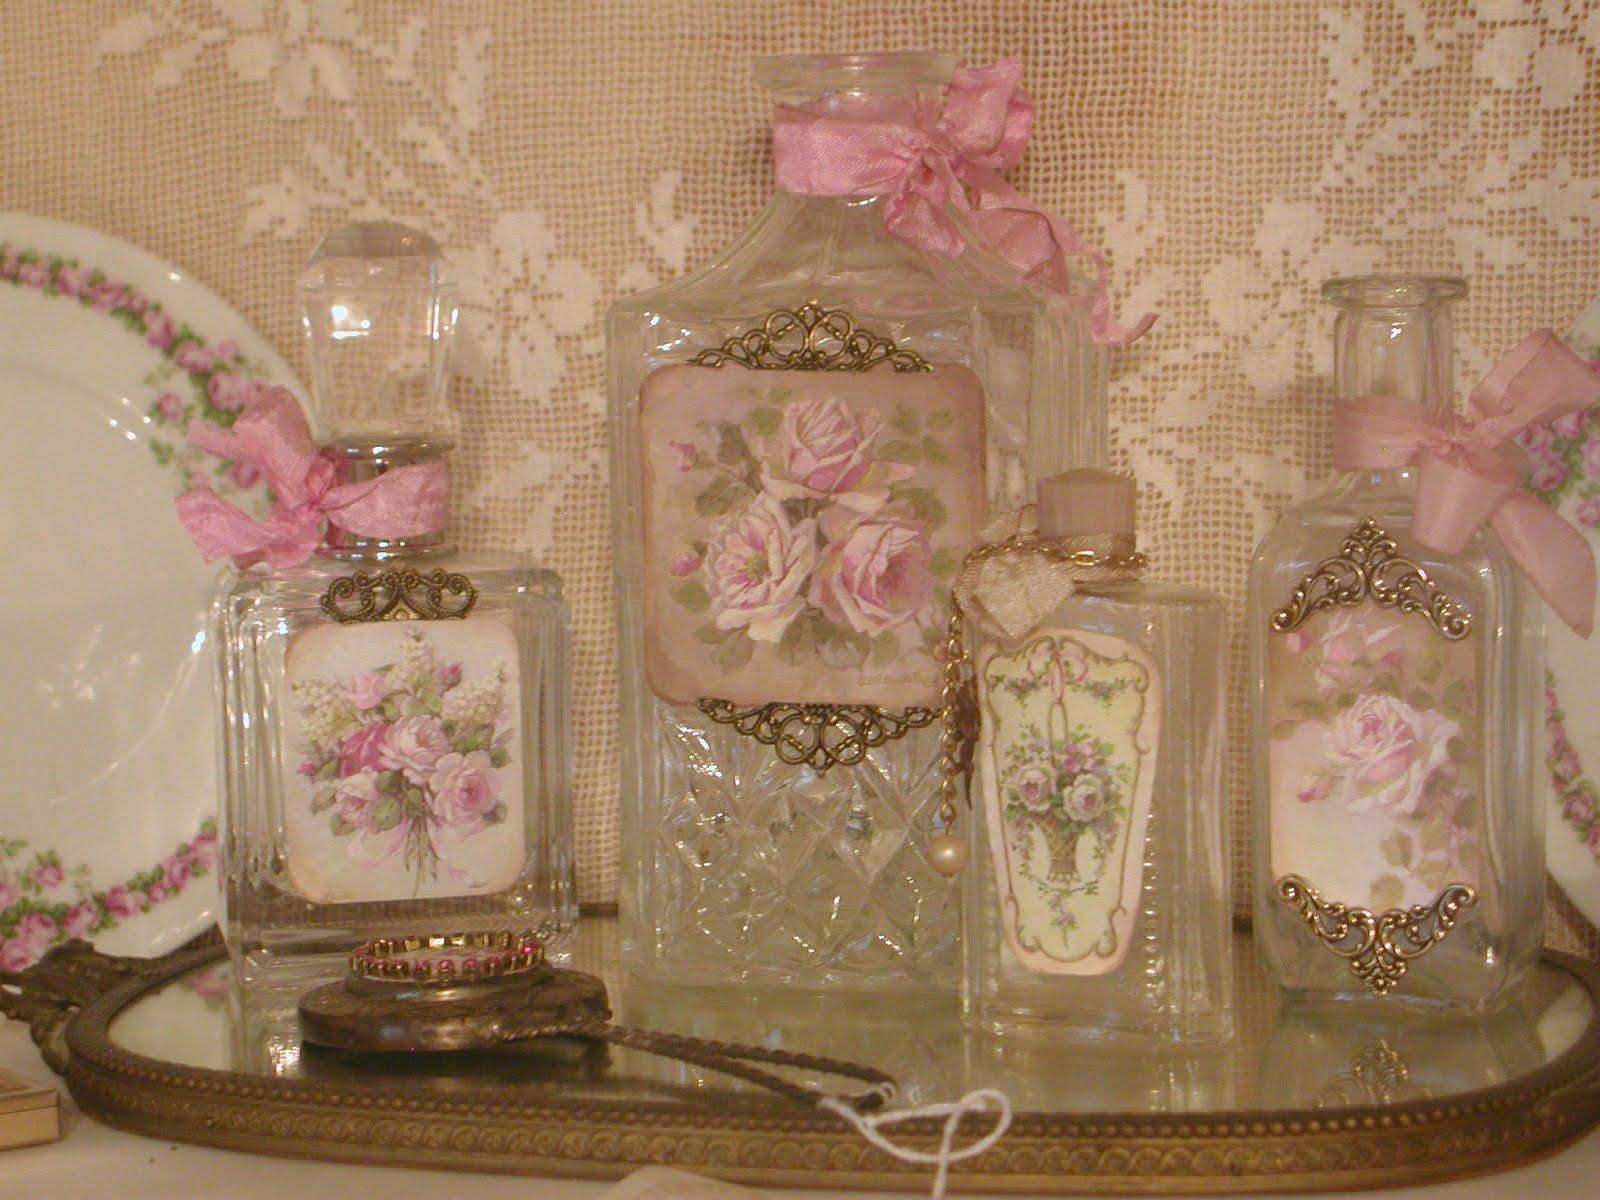 Chateau de fleurs french style perfume bottles - Decorar estilo shabby chic ...